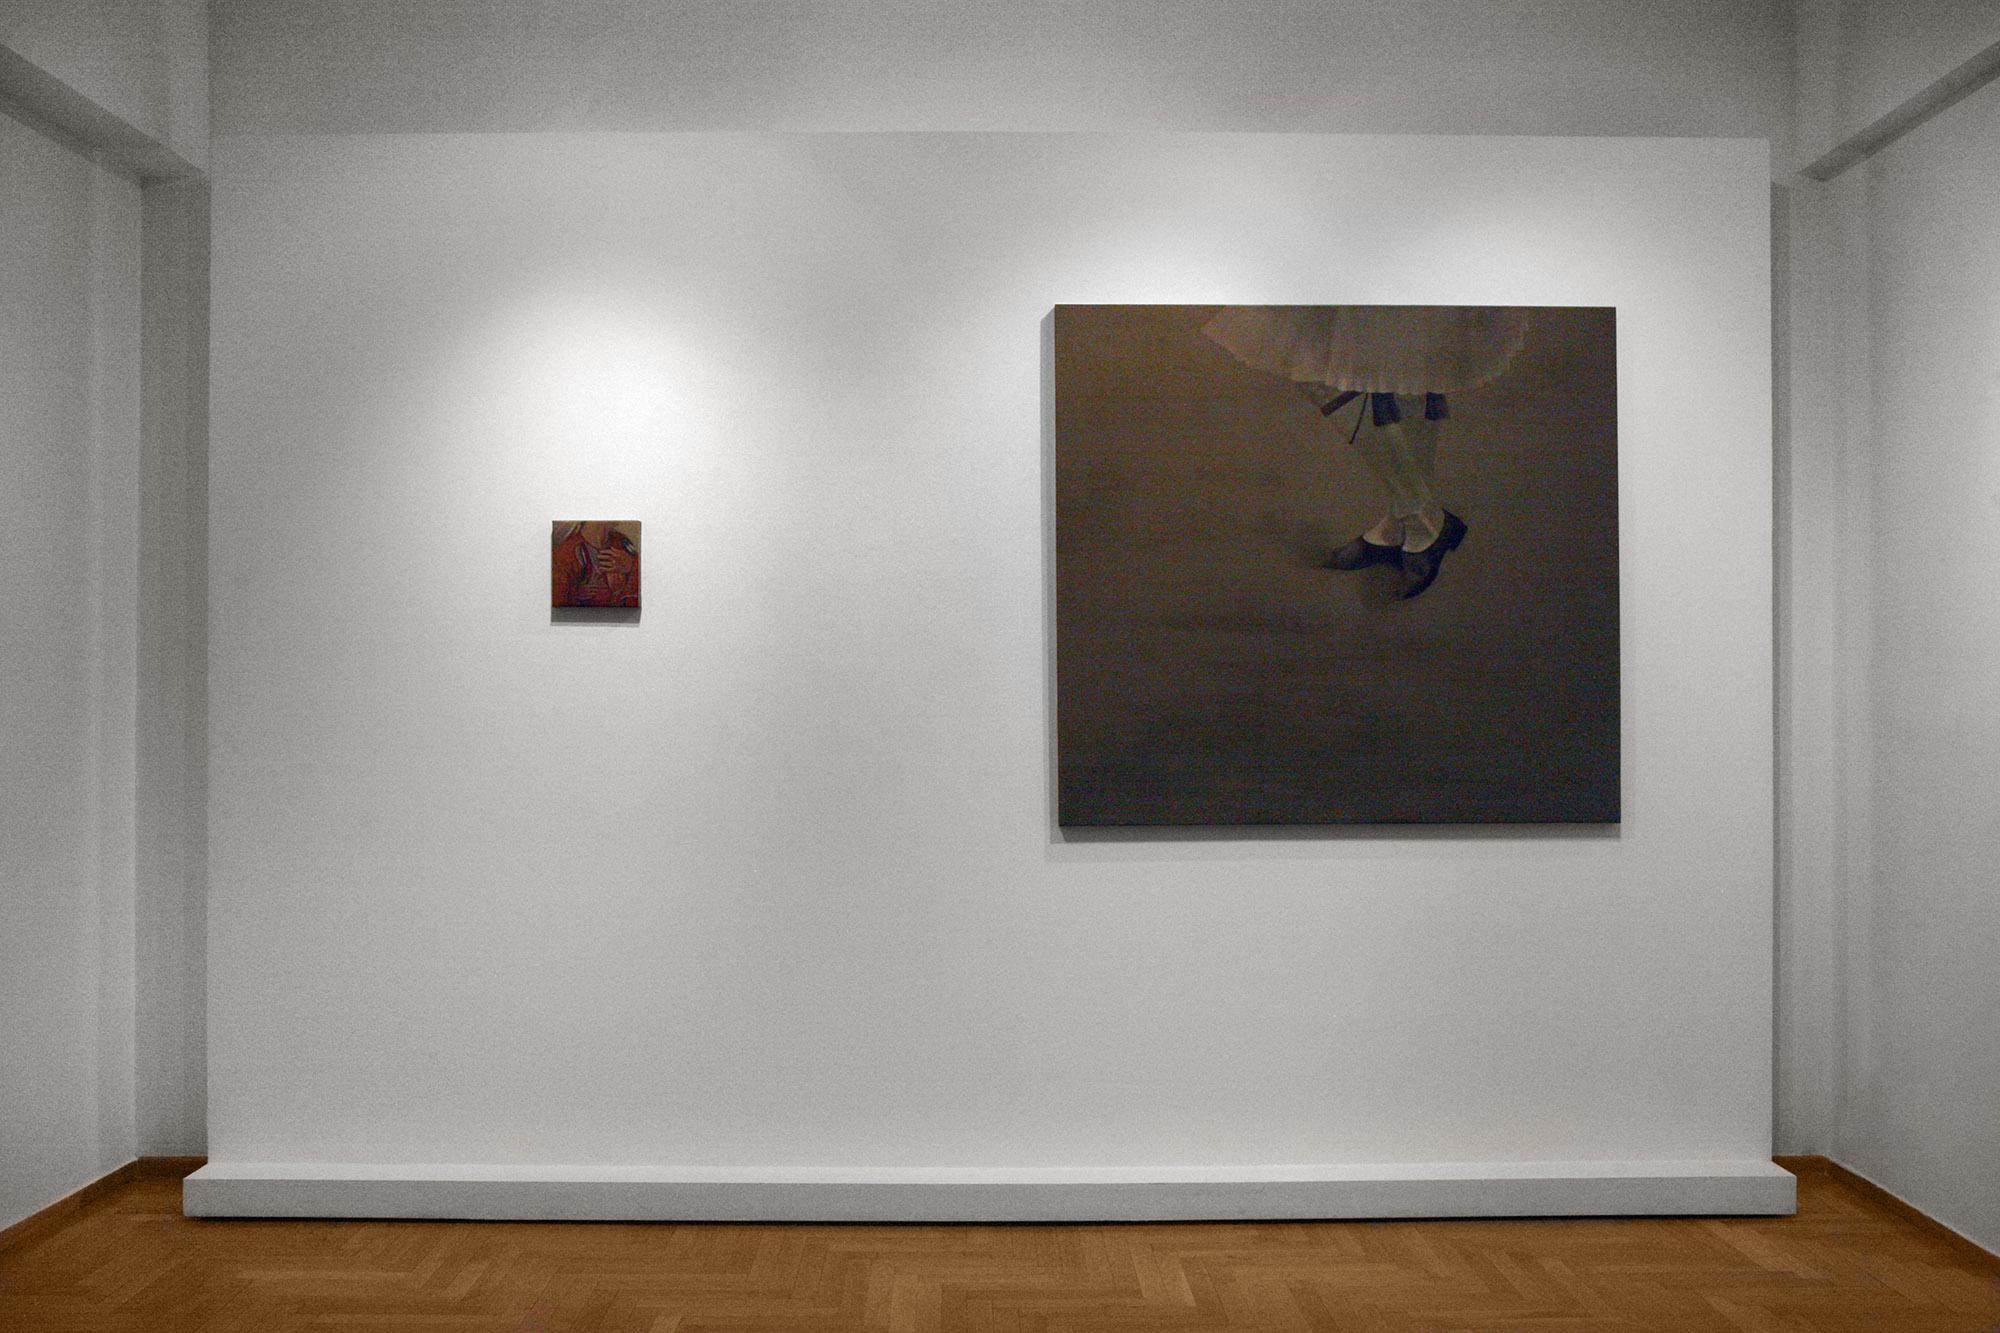 Vasilis Zografos / Missing - Image 2